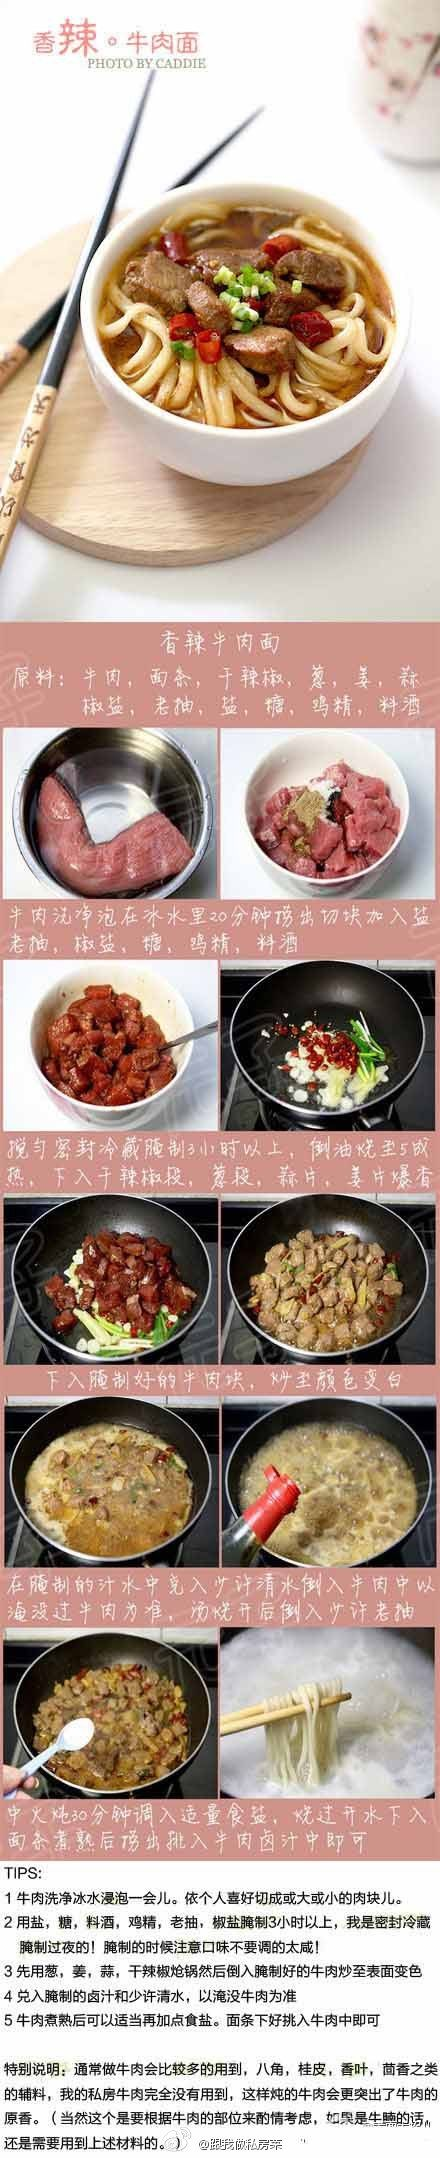 noodle menu ideas tutorial